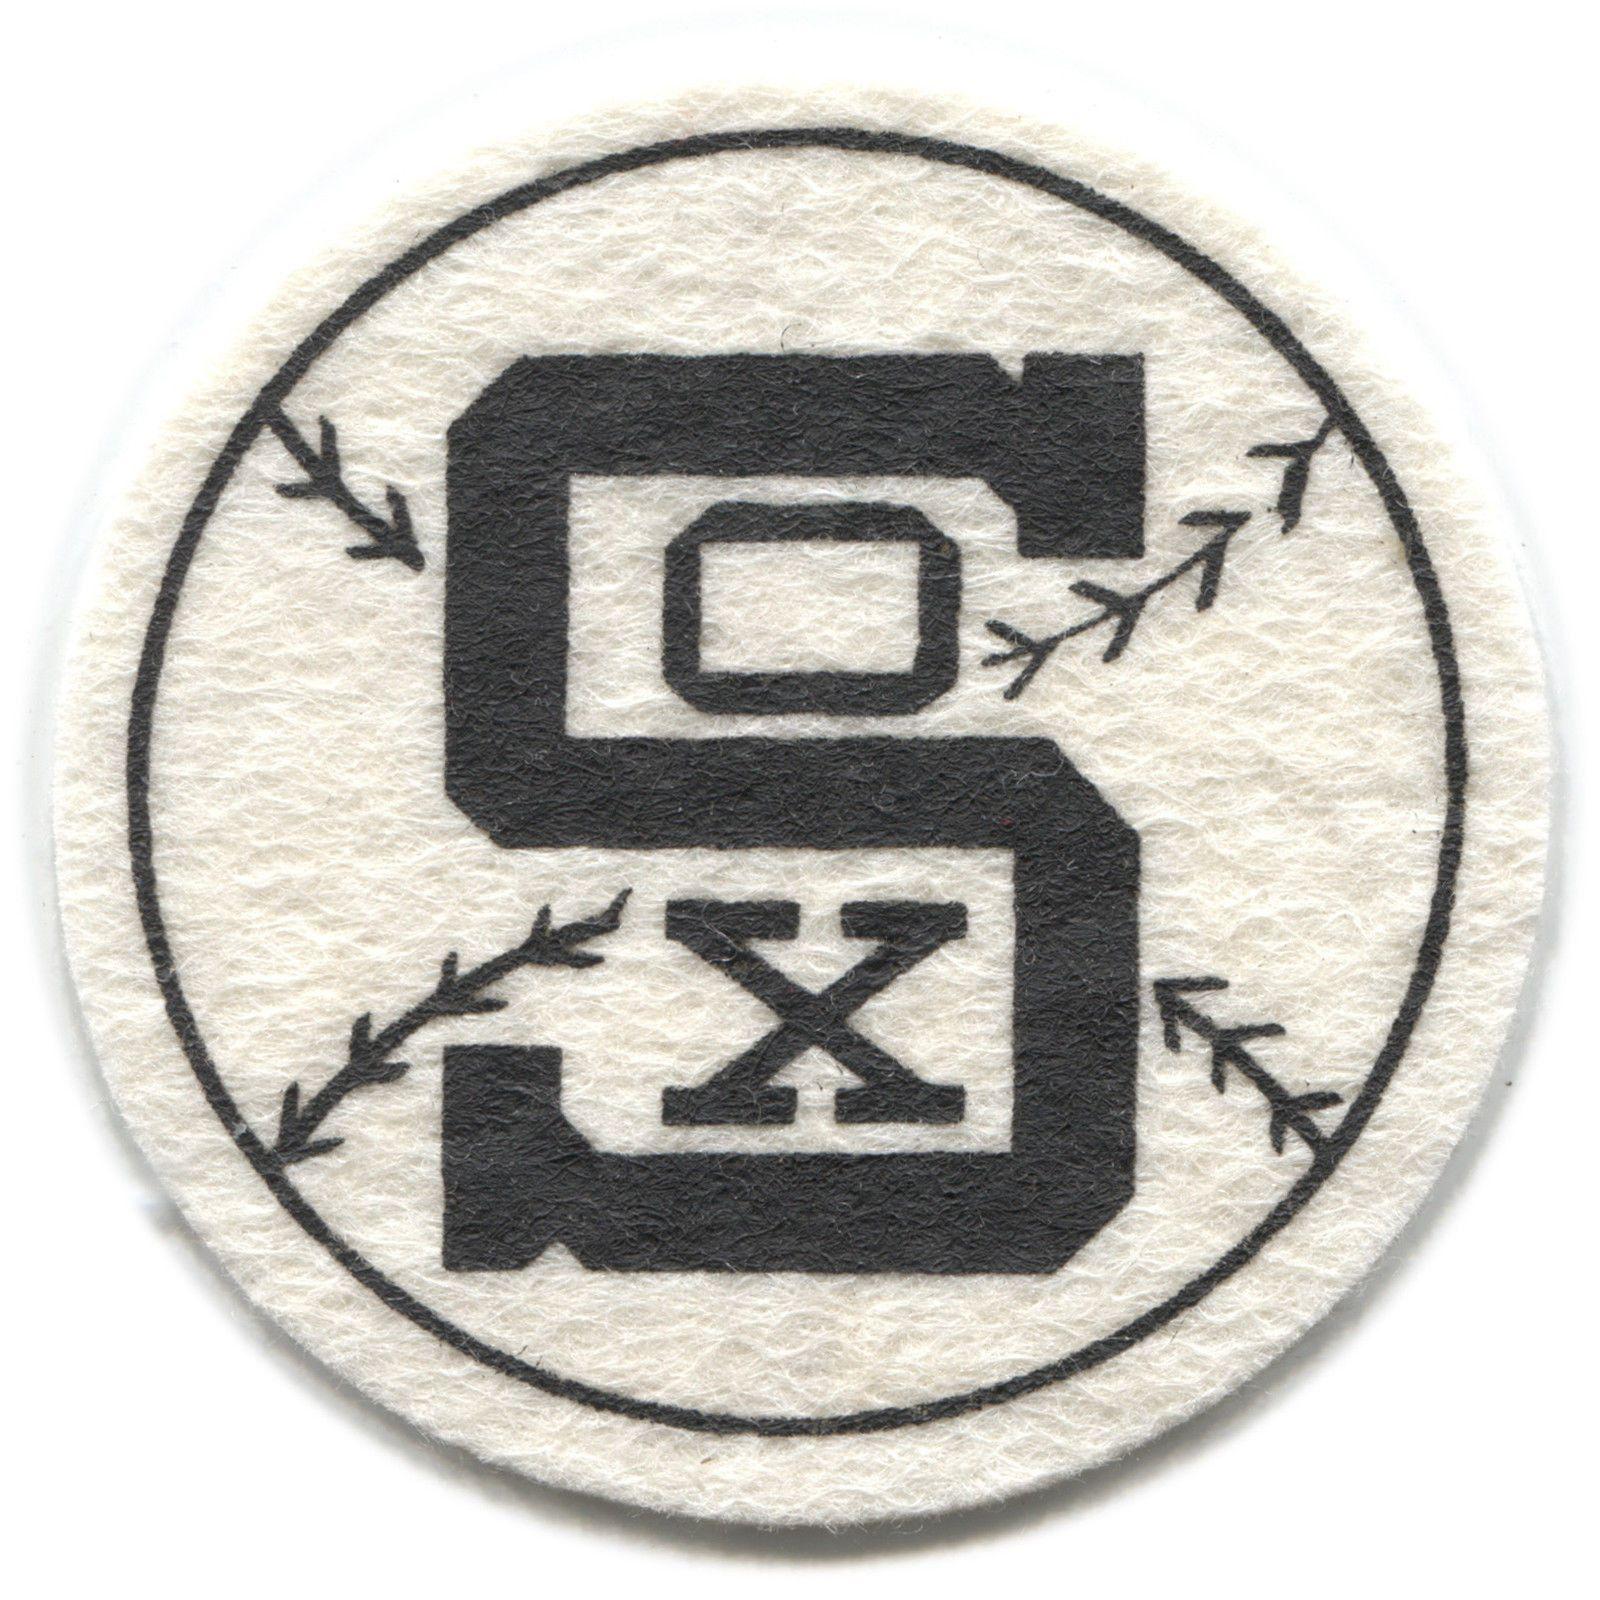 1954 Chicago White Sox Mlb Baseball Best And Co Vintage 2 5 Team Logo Patch Baseball Teams Logo Chicago White Sox Baseball